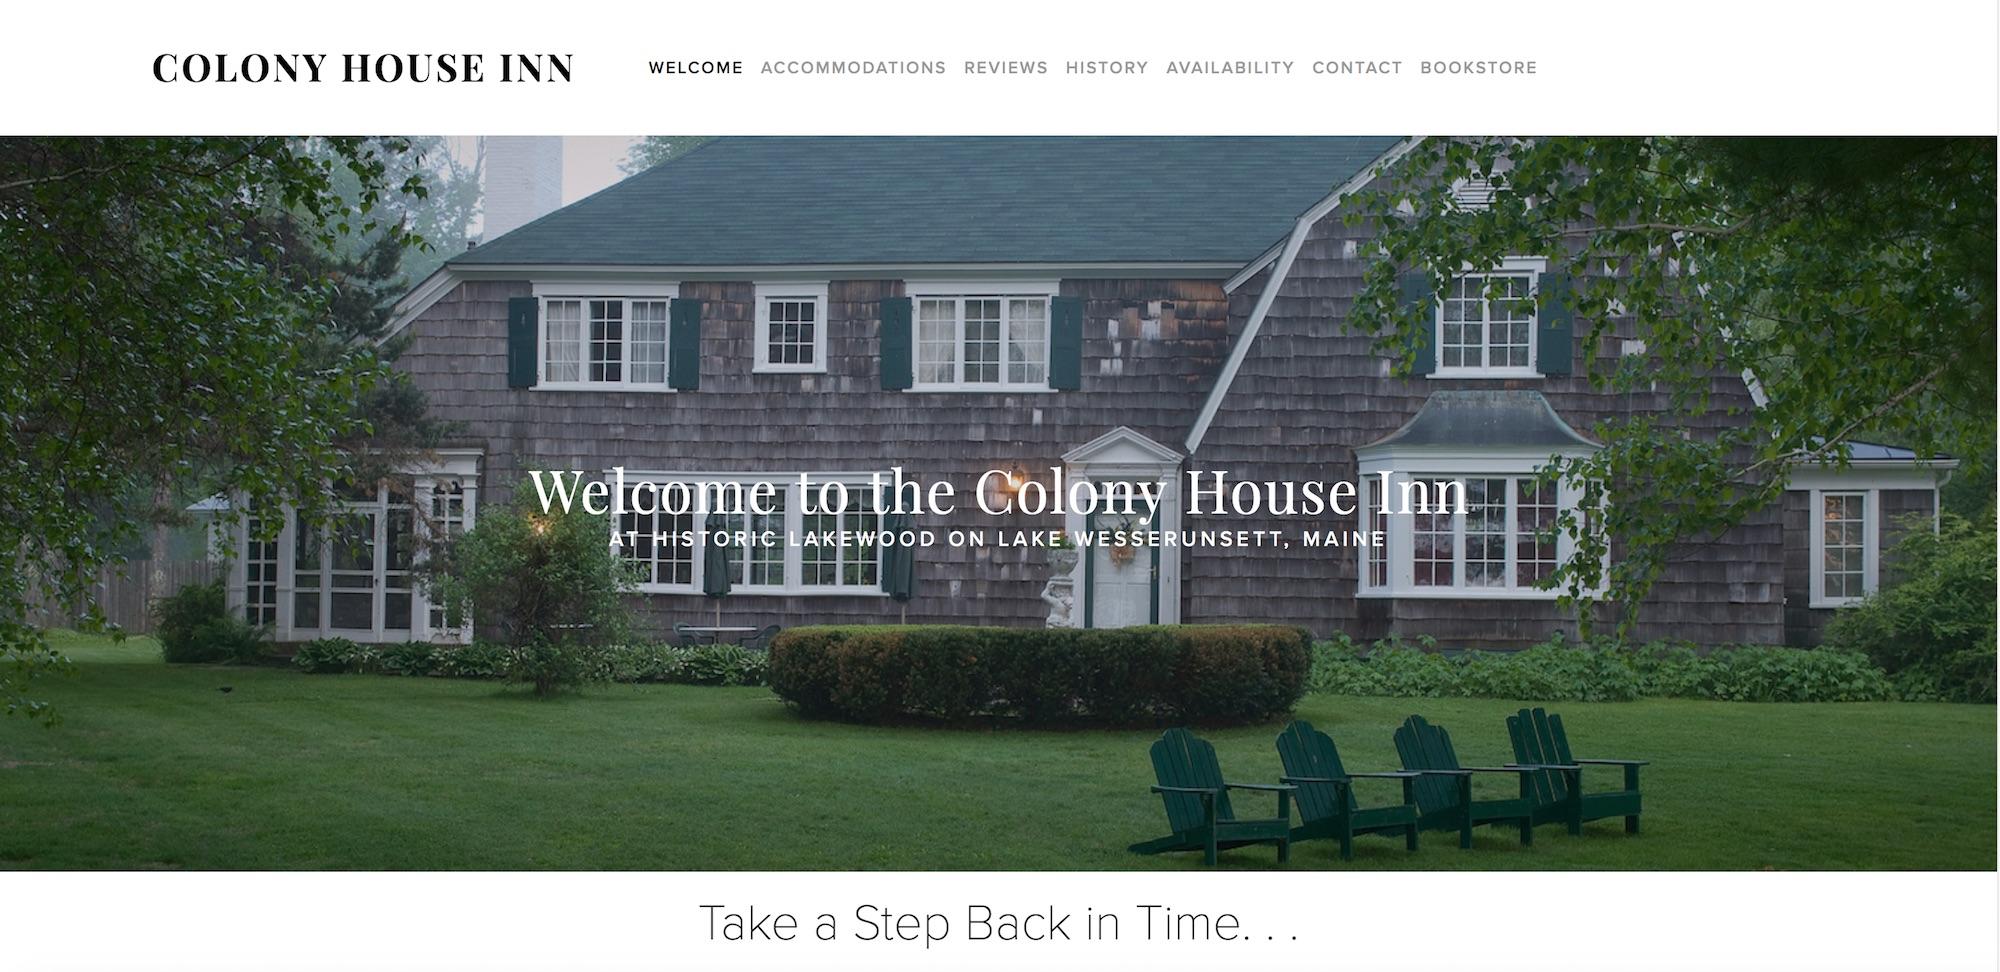 Colony House Inn Bed & Breakfast , Skowhegan, Maine [Coming Soon]